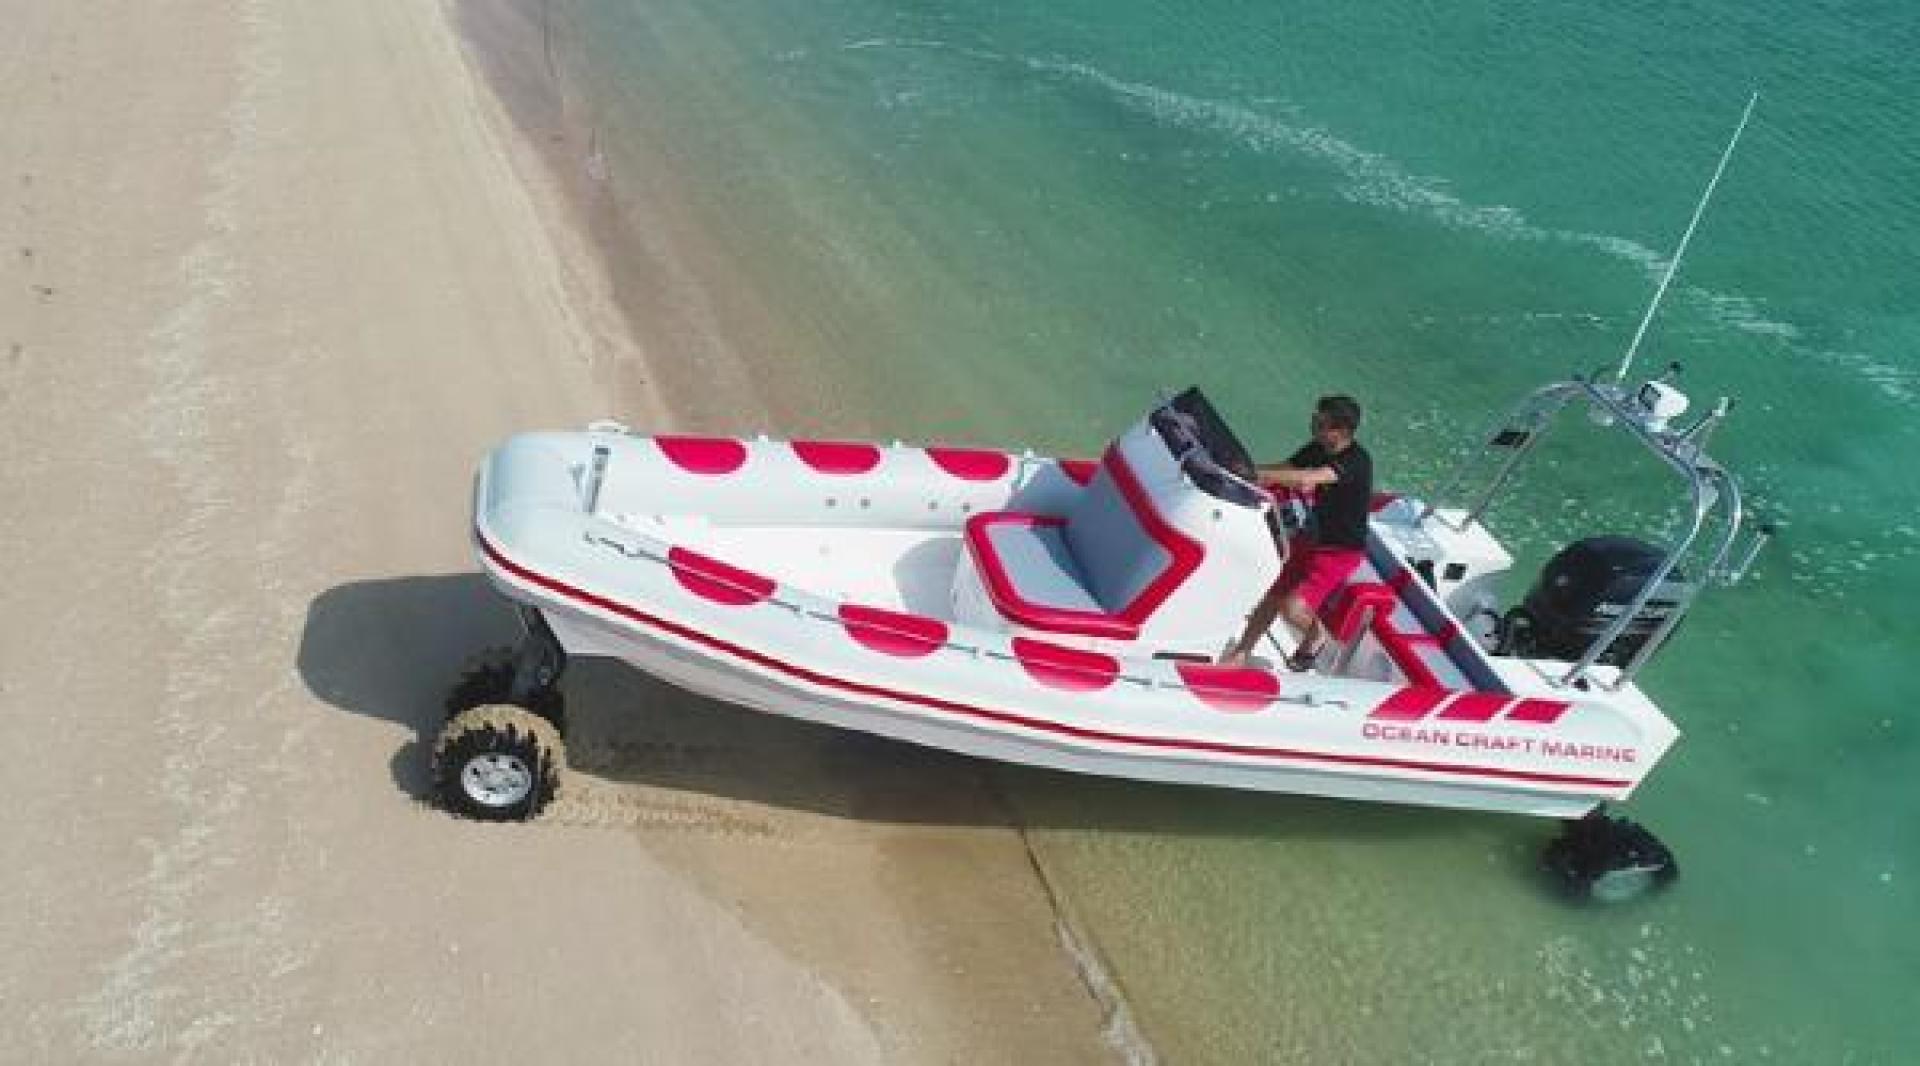 Ocean Craft Marine-7.1 M Amphibious 2021-Ocean Craft Marine 7.1 M Amphibious Fort Lauderdale-Florida-United States-1523229 | Thumbnail